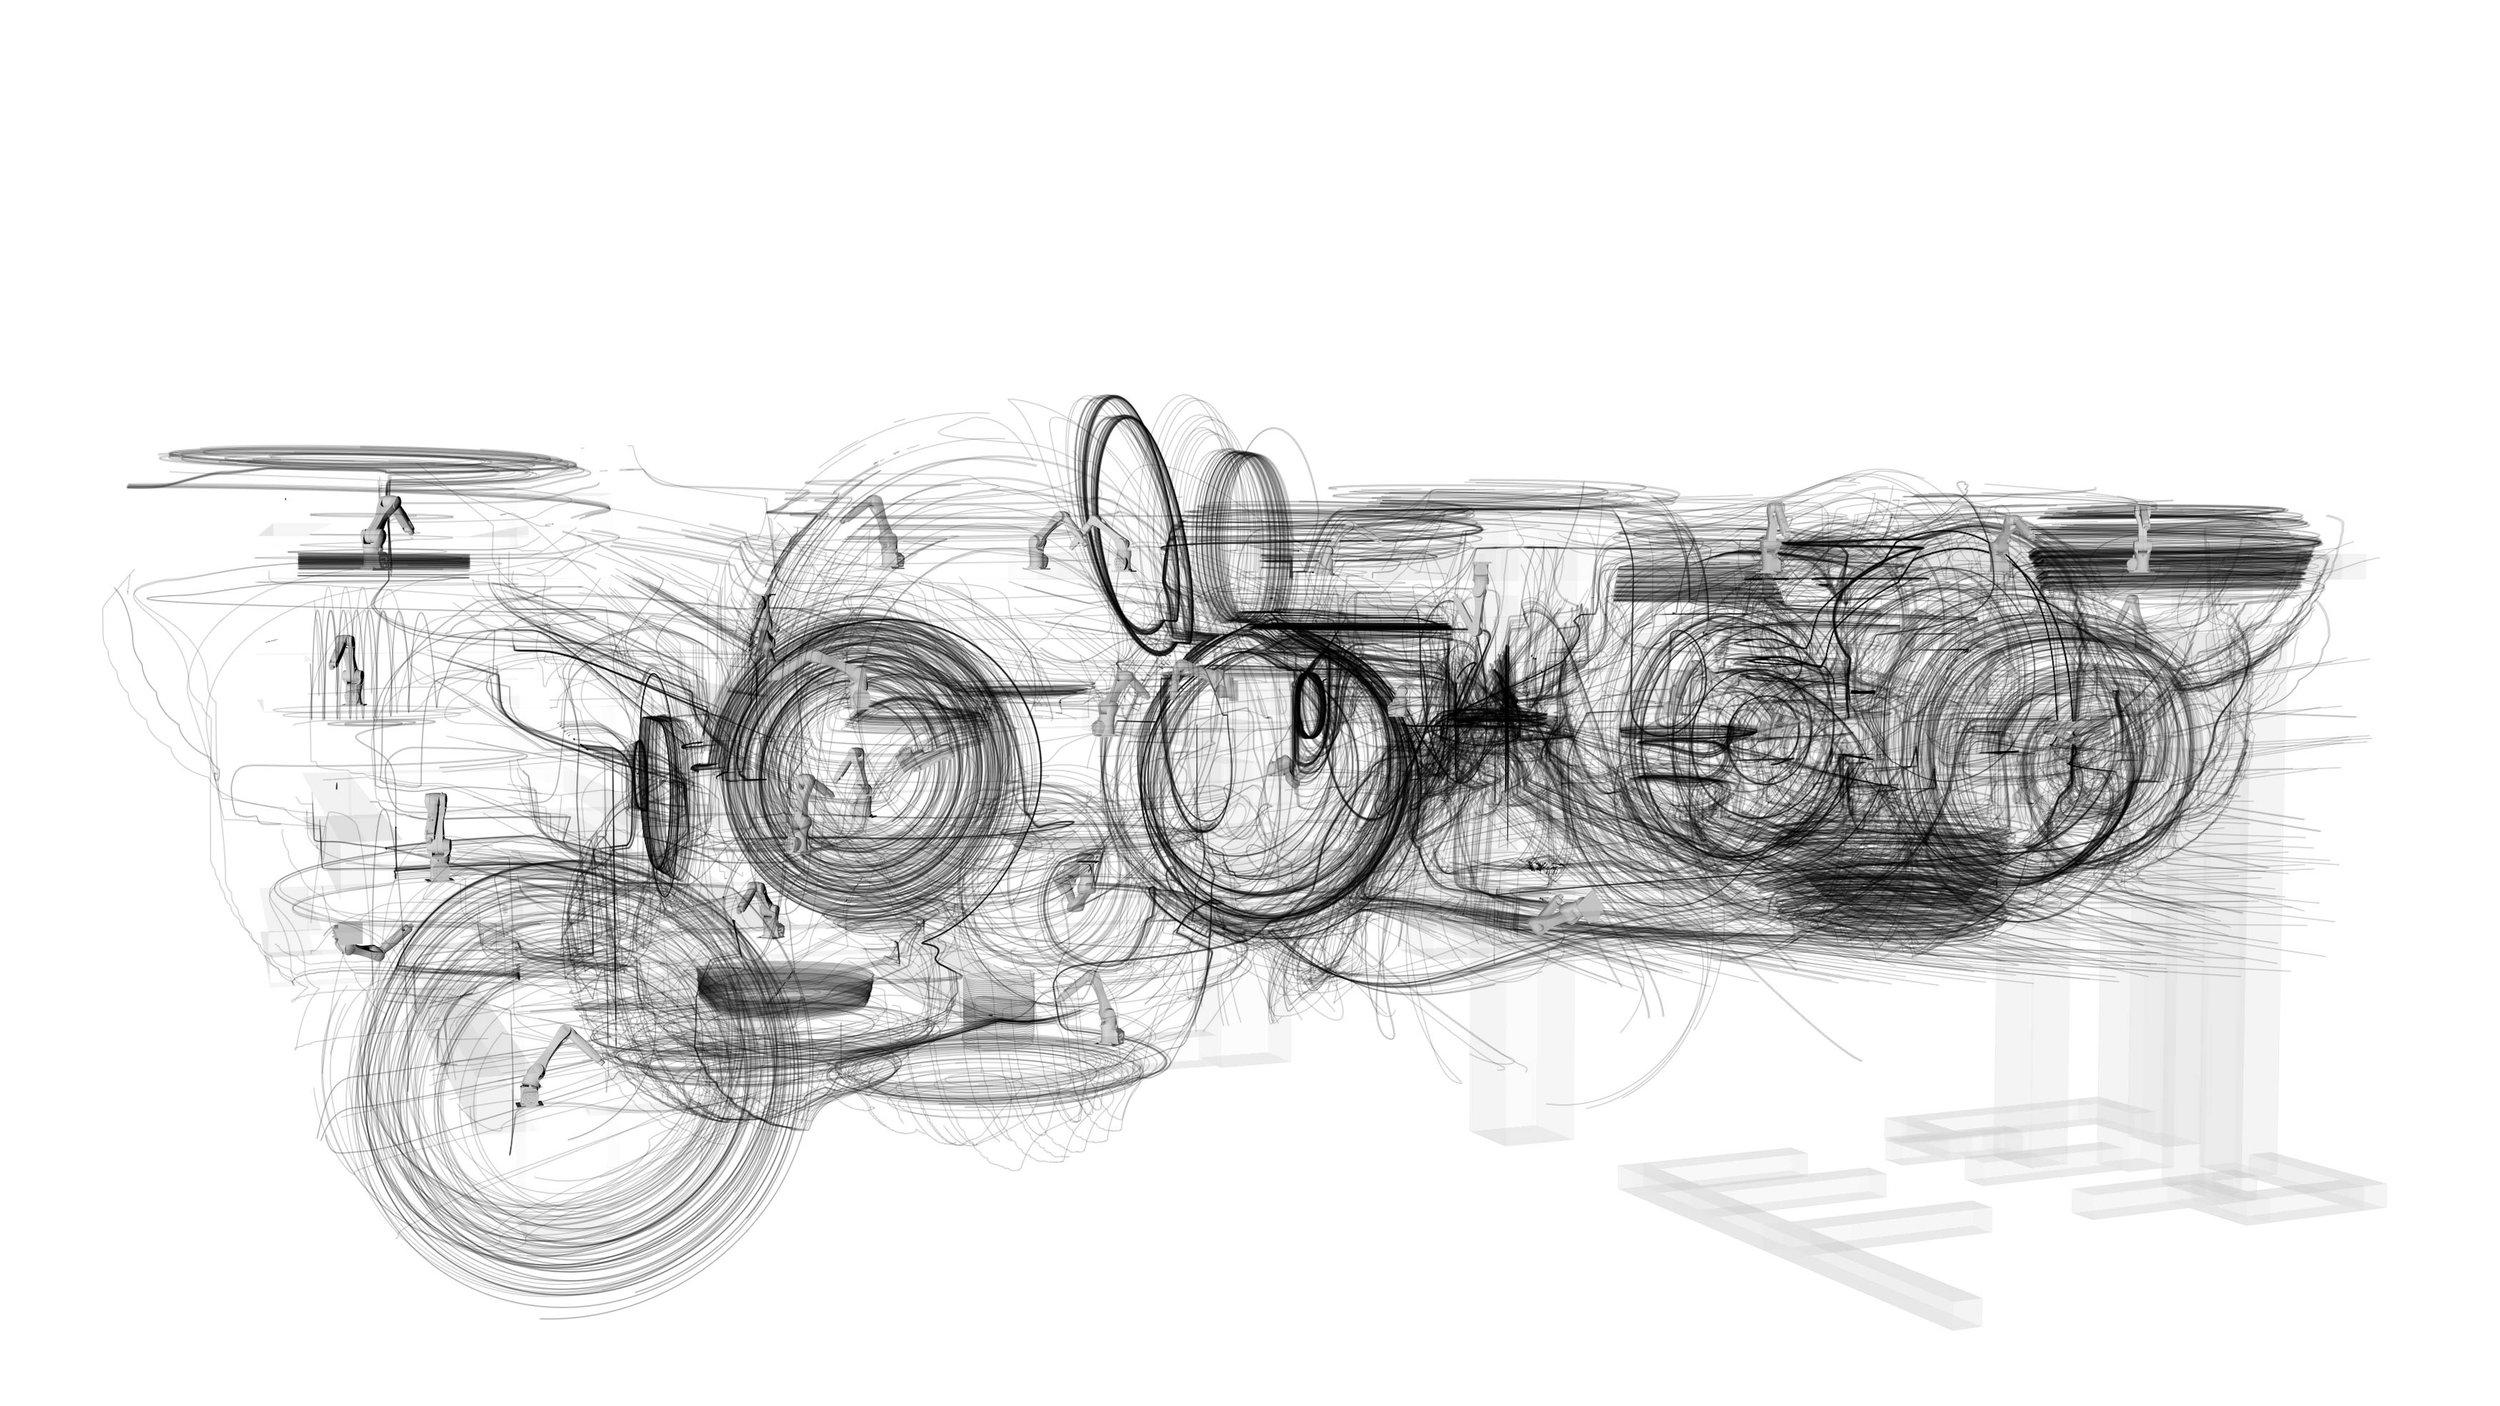 Web_machinespectacle_alexandramoisi_adrianherk_floriansmutny_particlediagramrobots_ws15.jpg